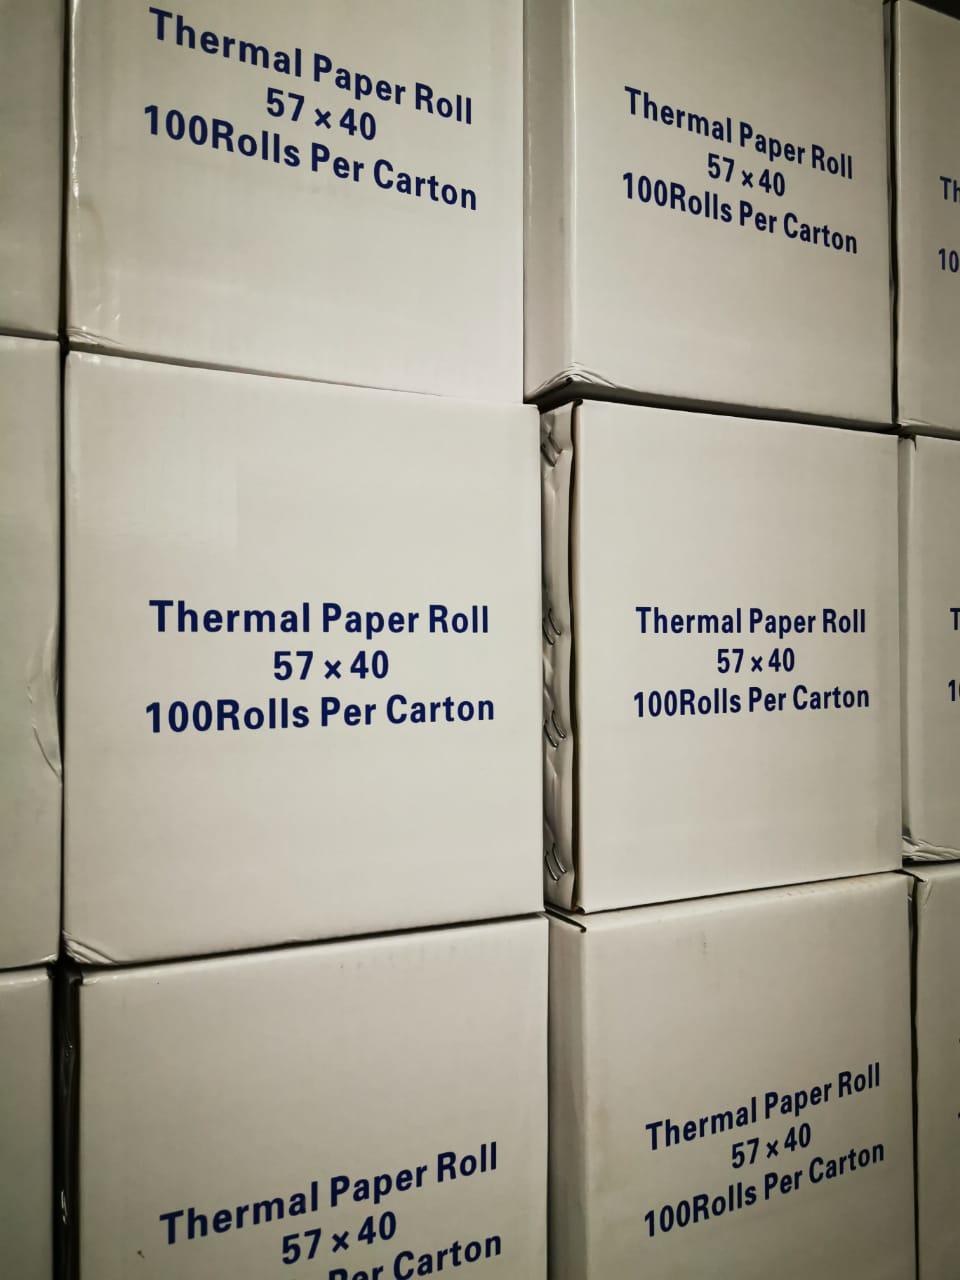 Till Thermal paper